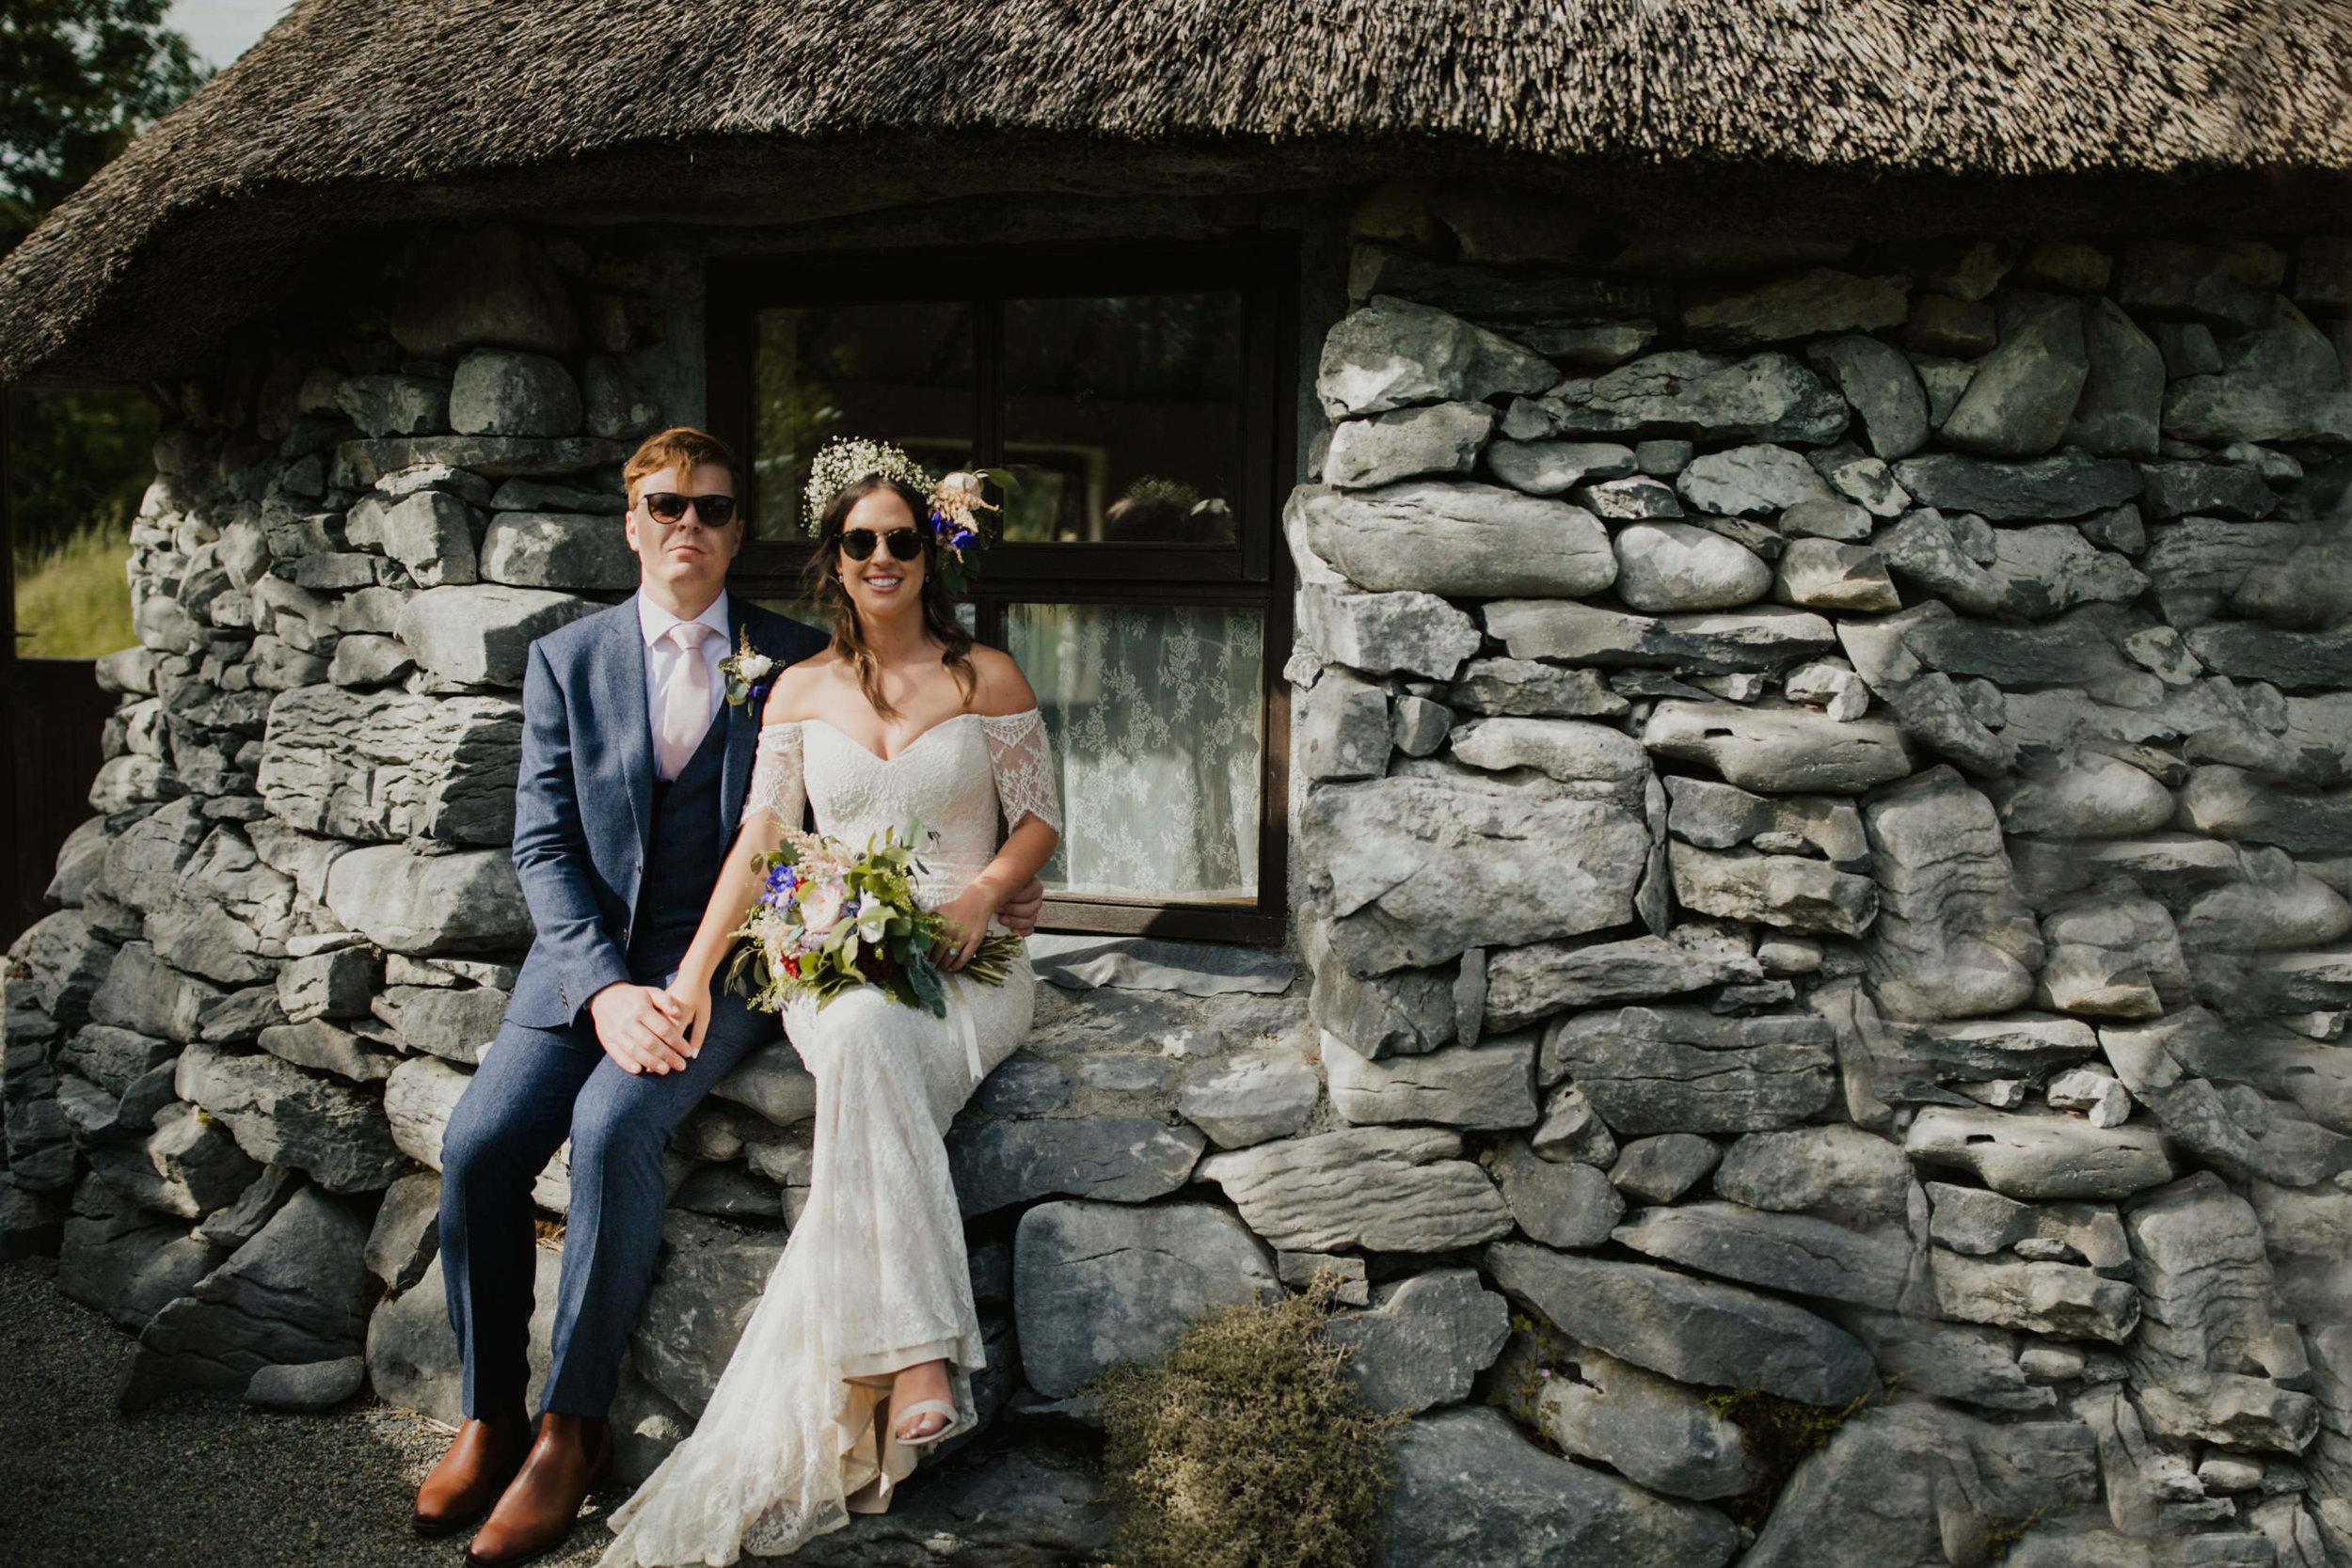 c&j_brigits_garden_galway_wedding_photographer_livia_figueiredo_30.jpg